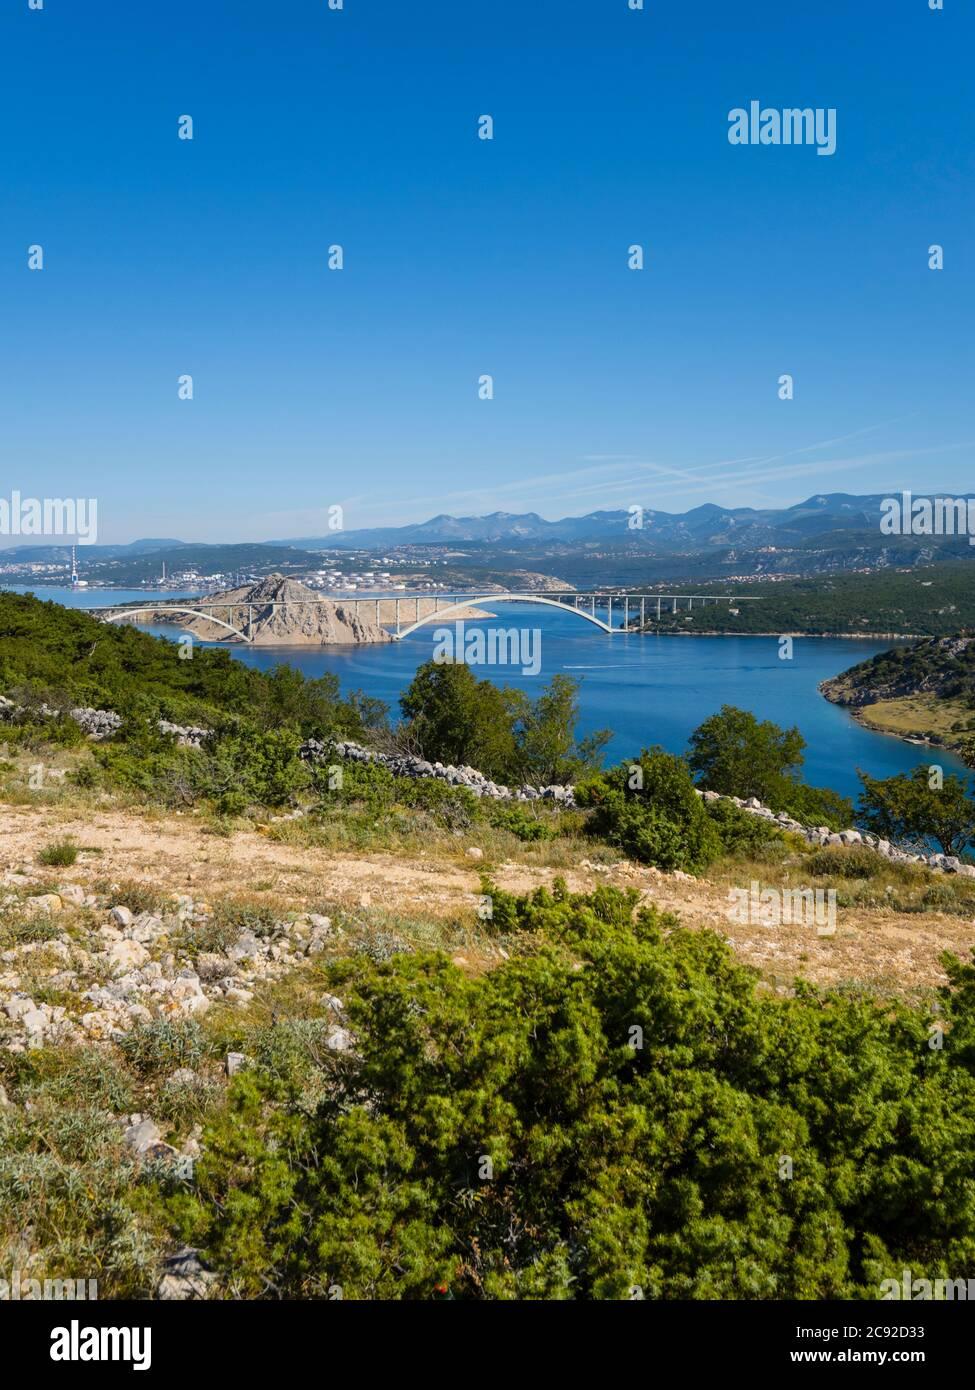 Scenery view atop Voz towards bridge to mainland on island Krk in Croatia Europe Stock Photo